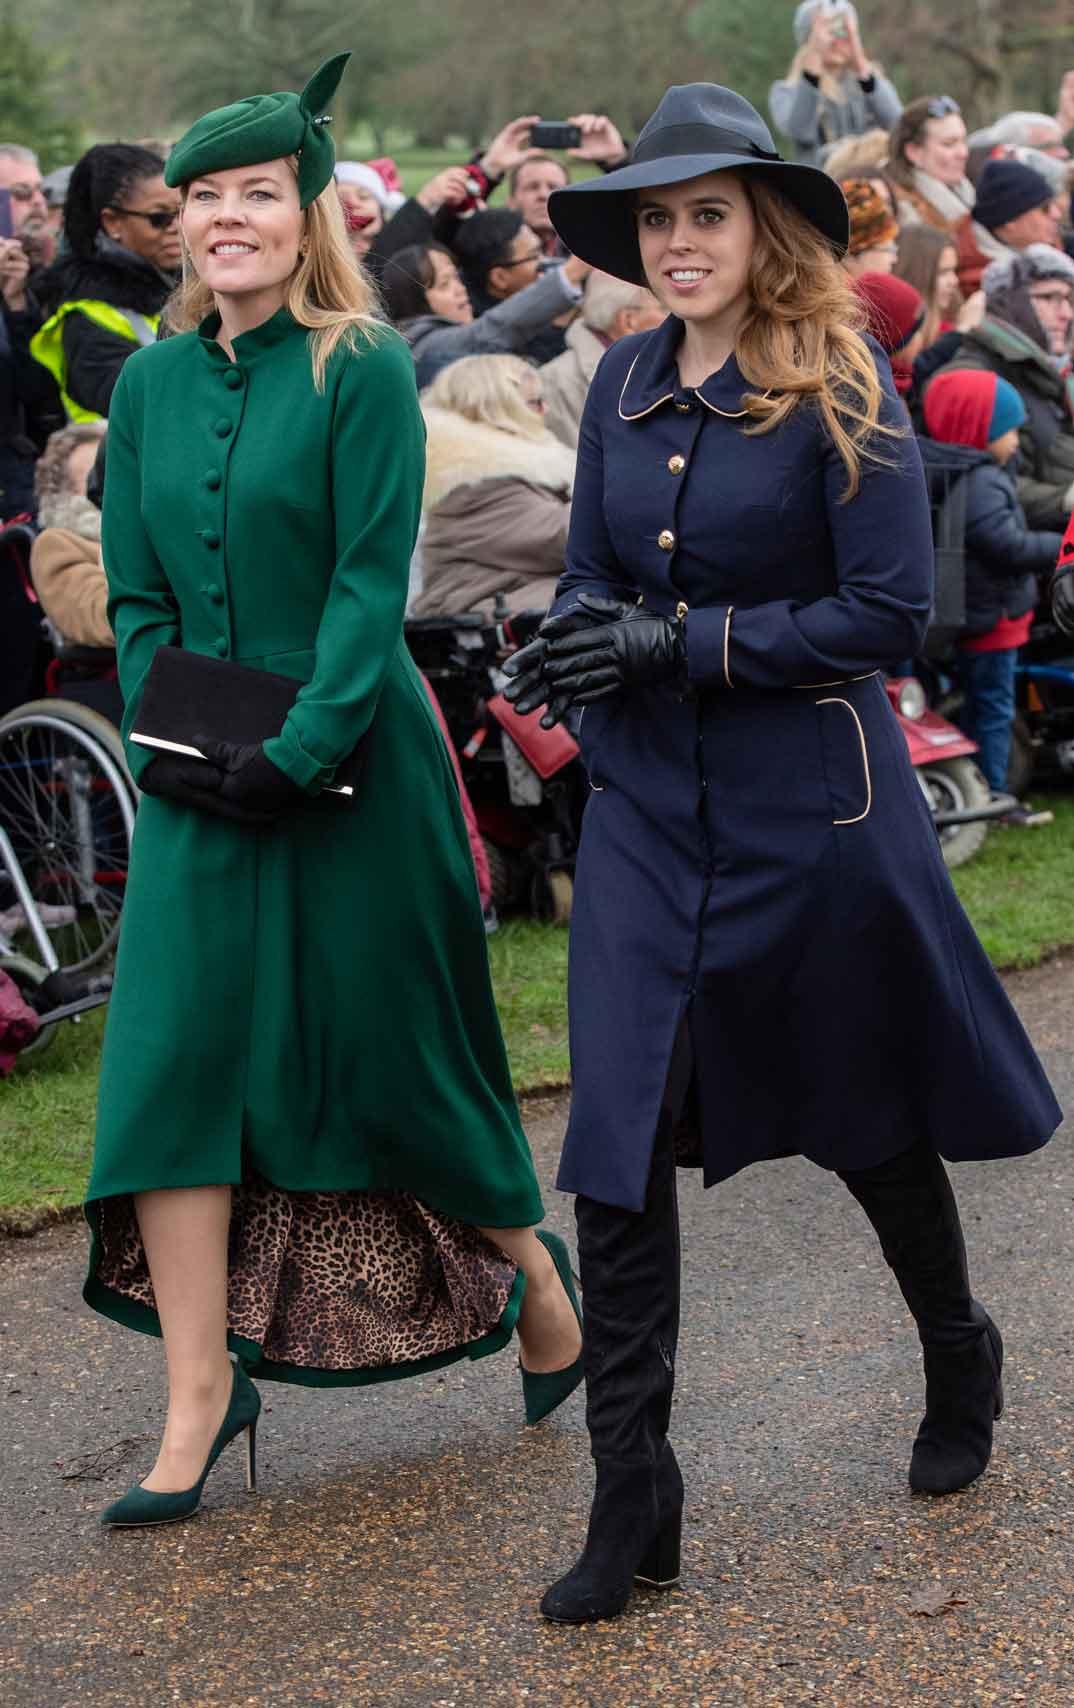 Autumn Phillips y la princesa Beatrice